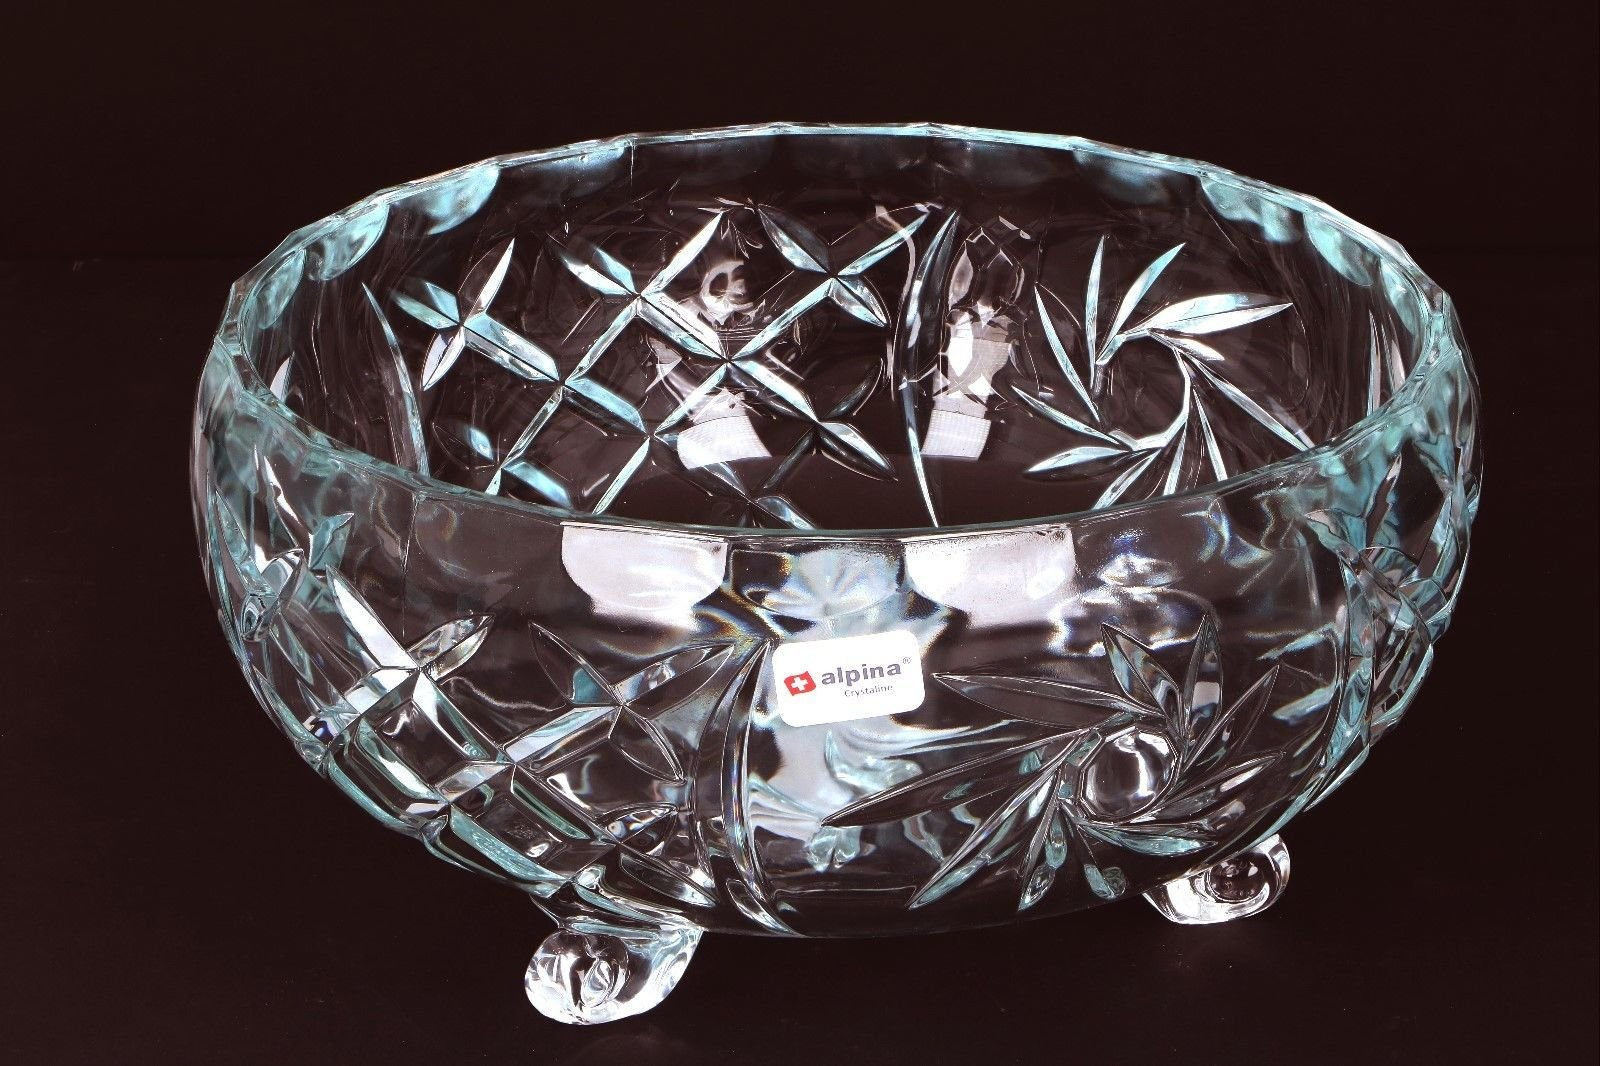 Alpina porcelianinio stiklo serviravimo indas